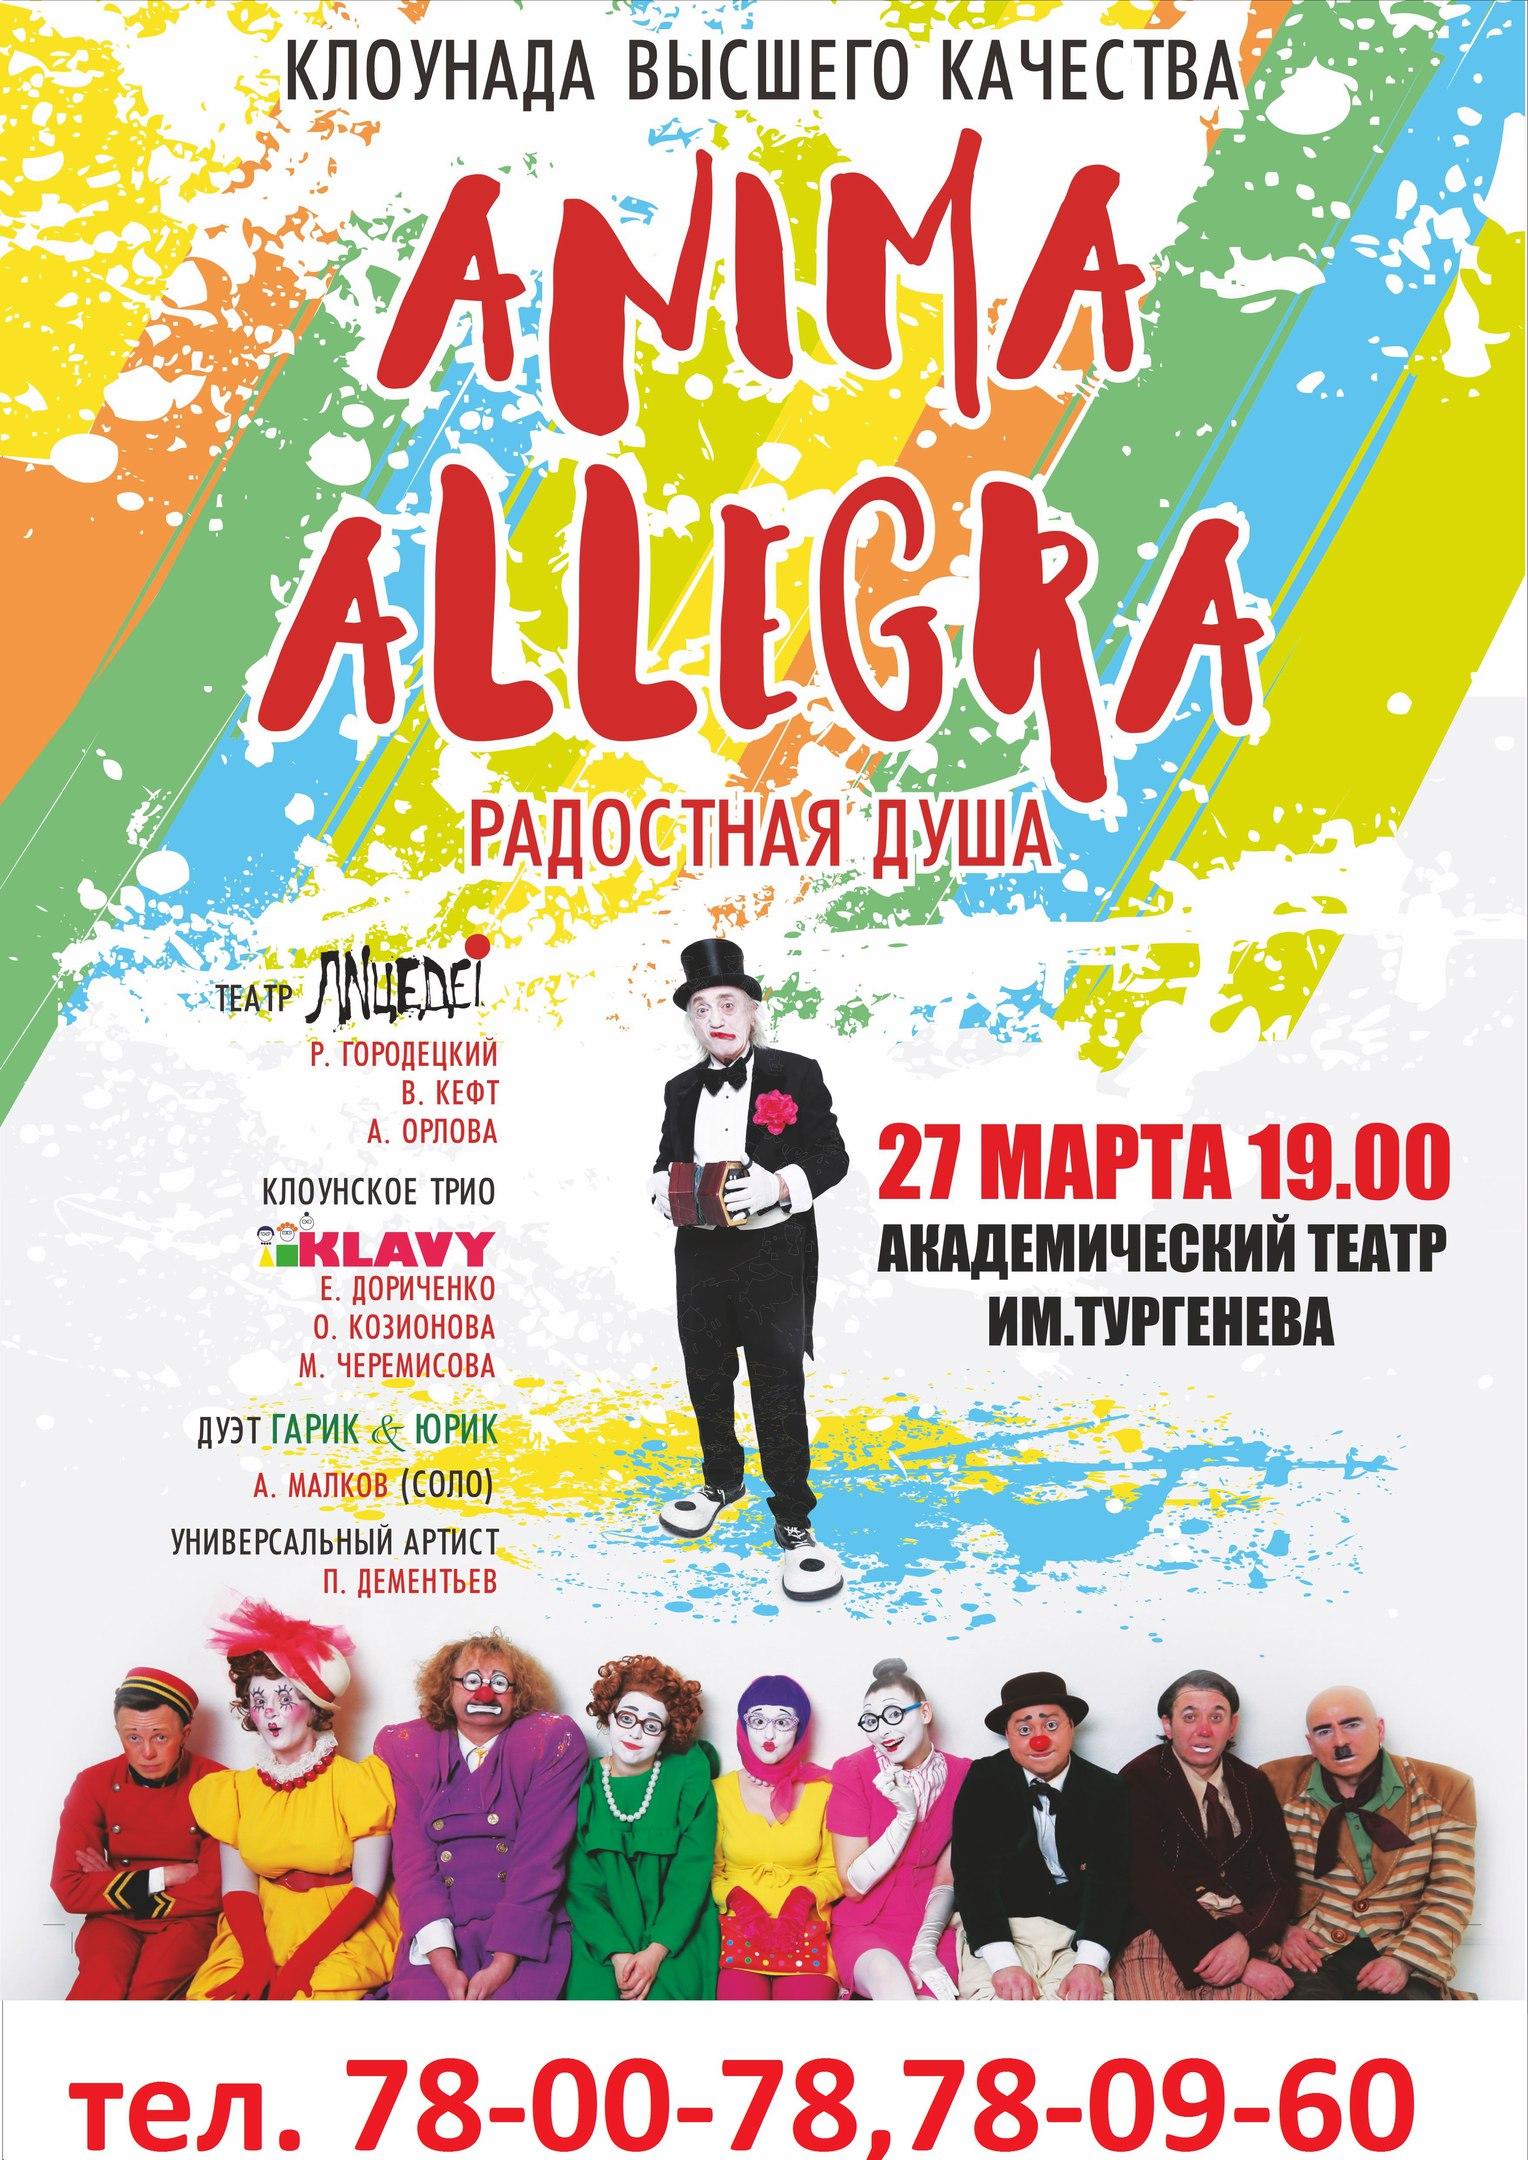 Anima Allegra — Радостная душа